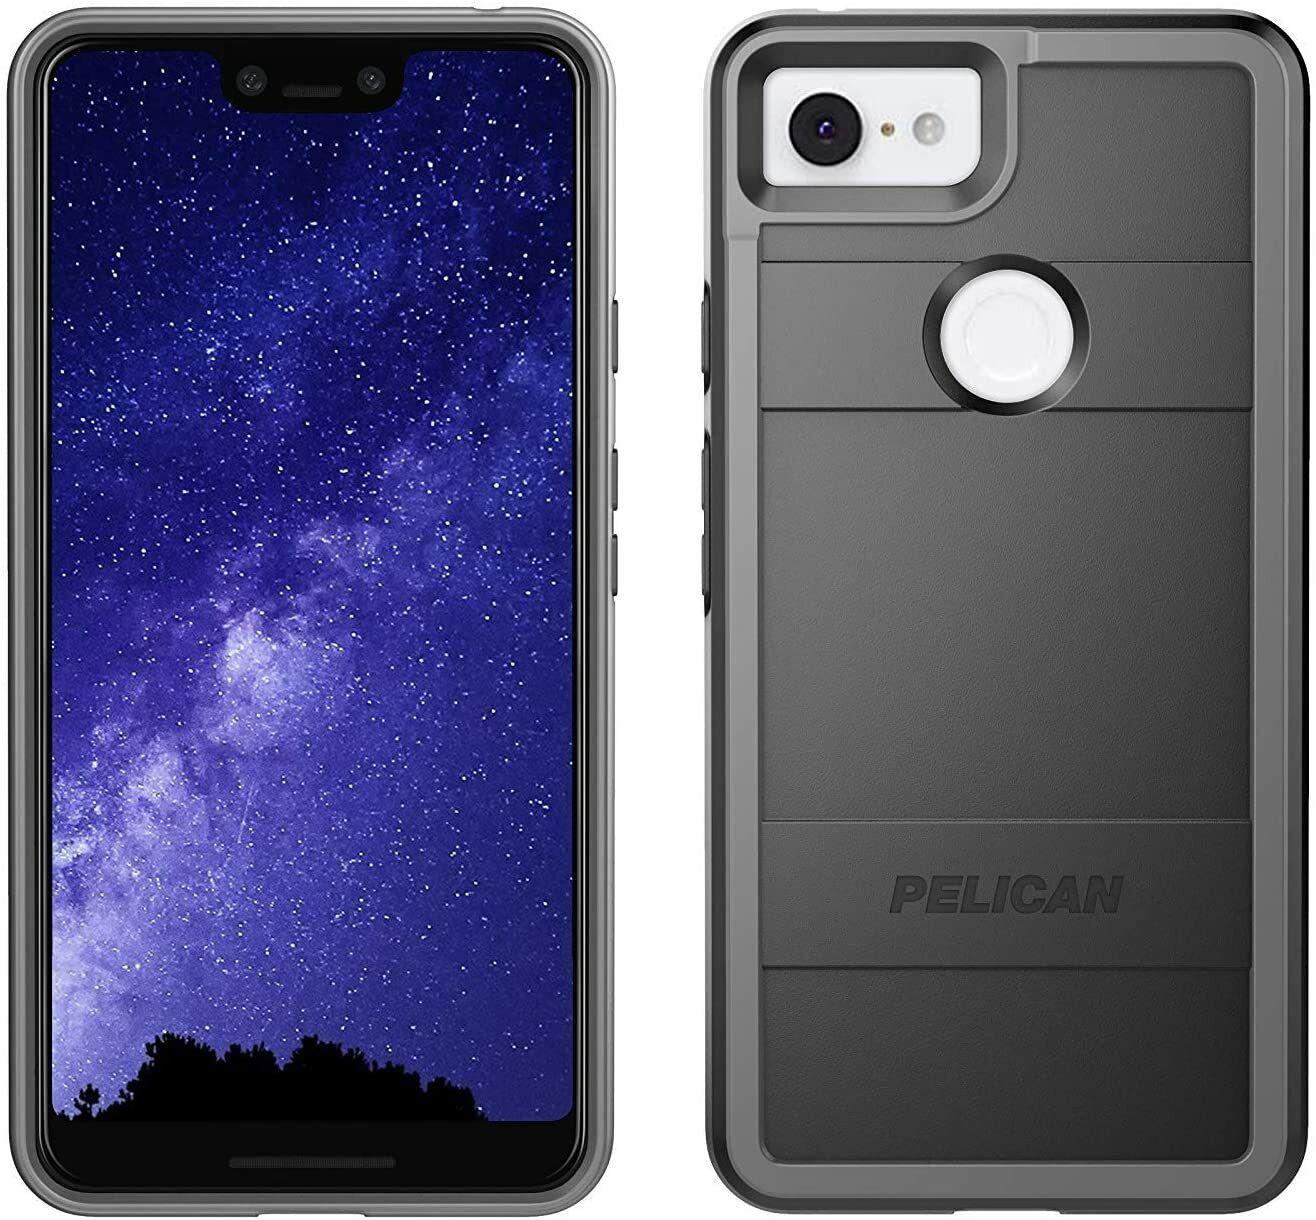 Pelican Protector Google Pixel 3 XL Case Black/Light Grey - $17.99